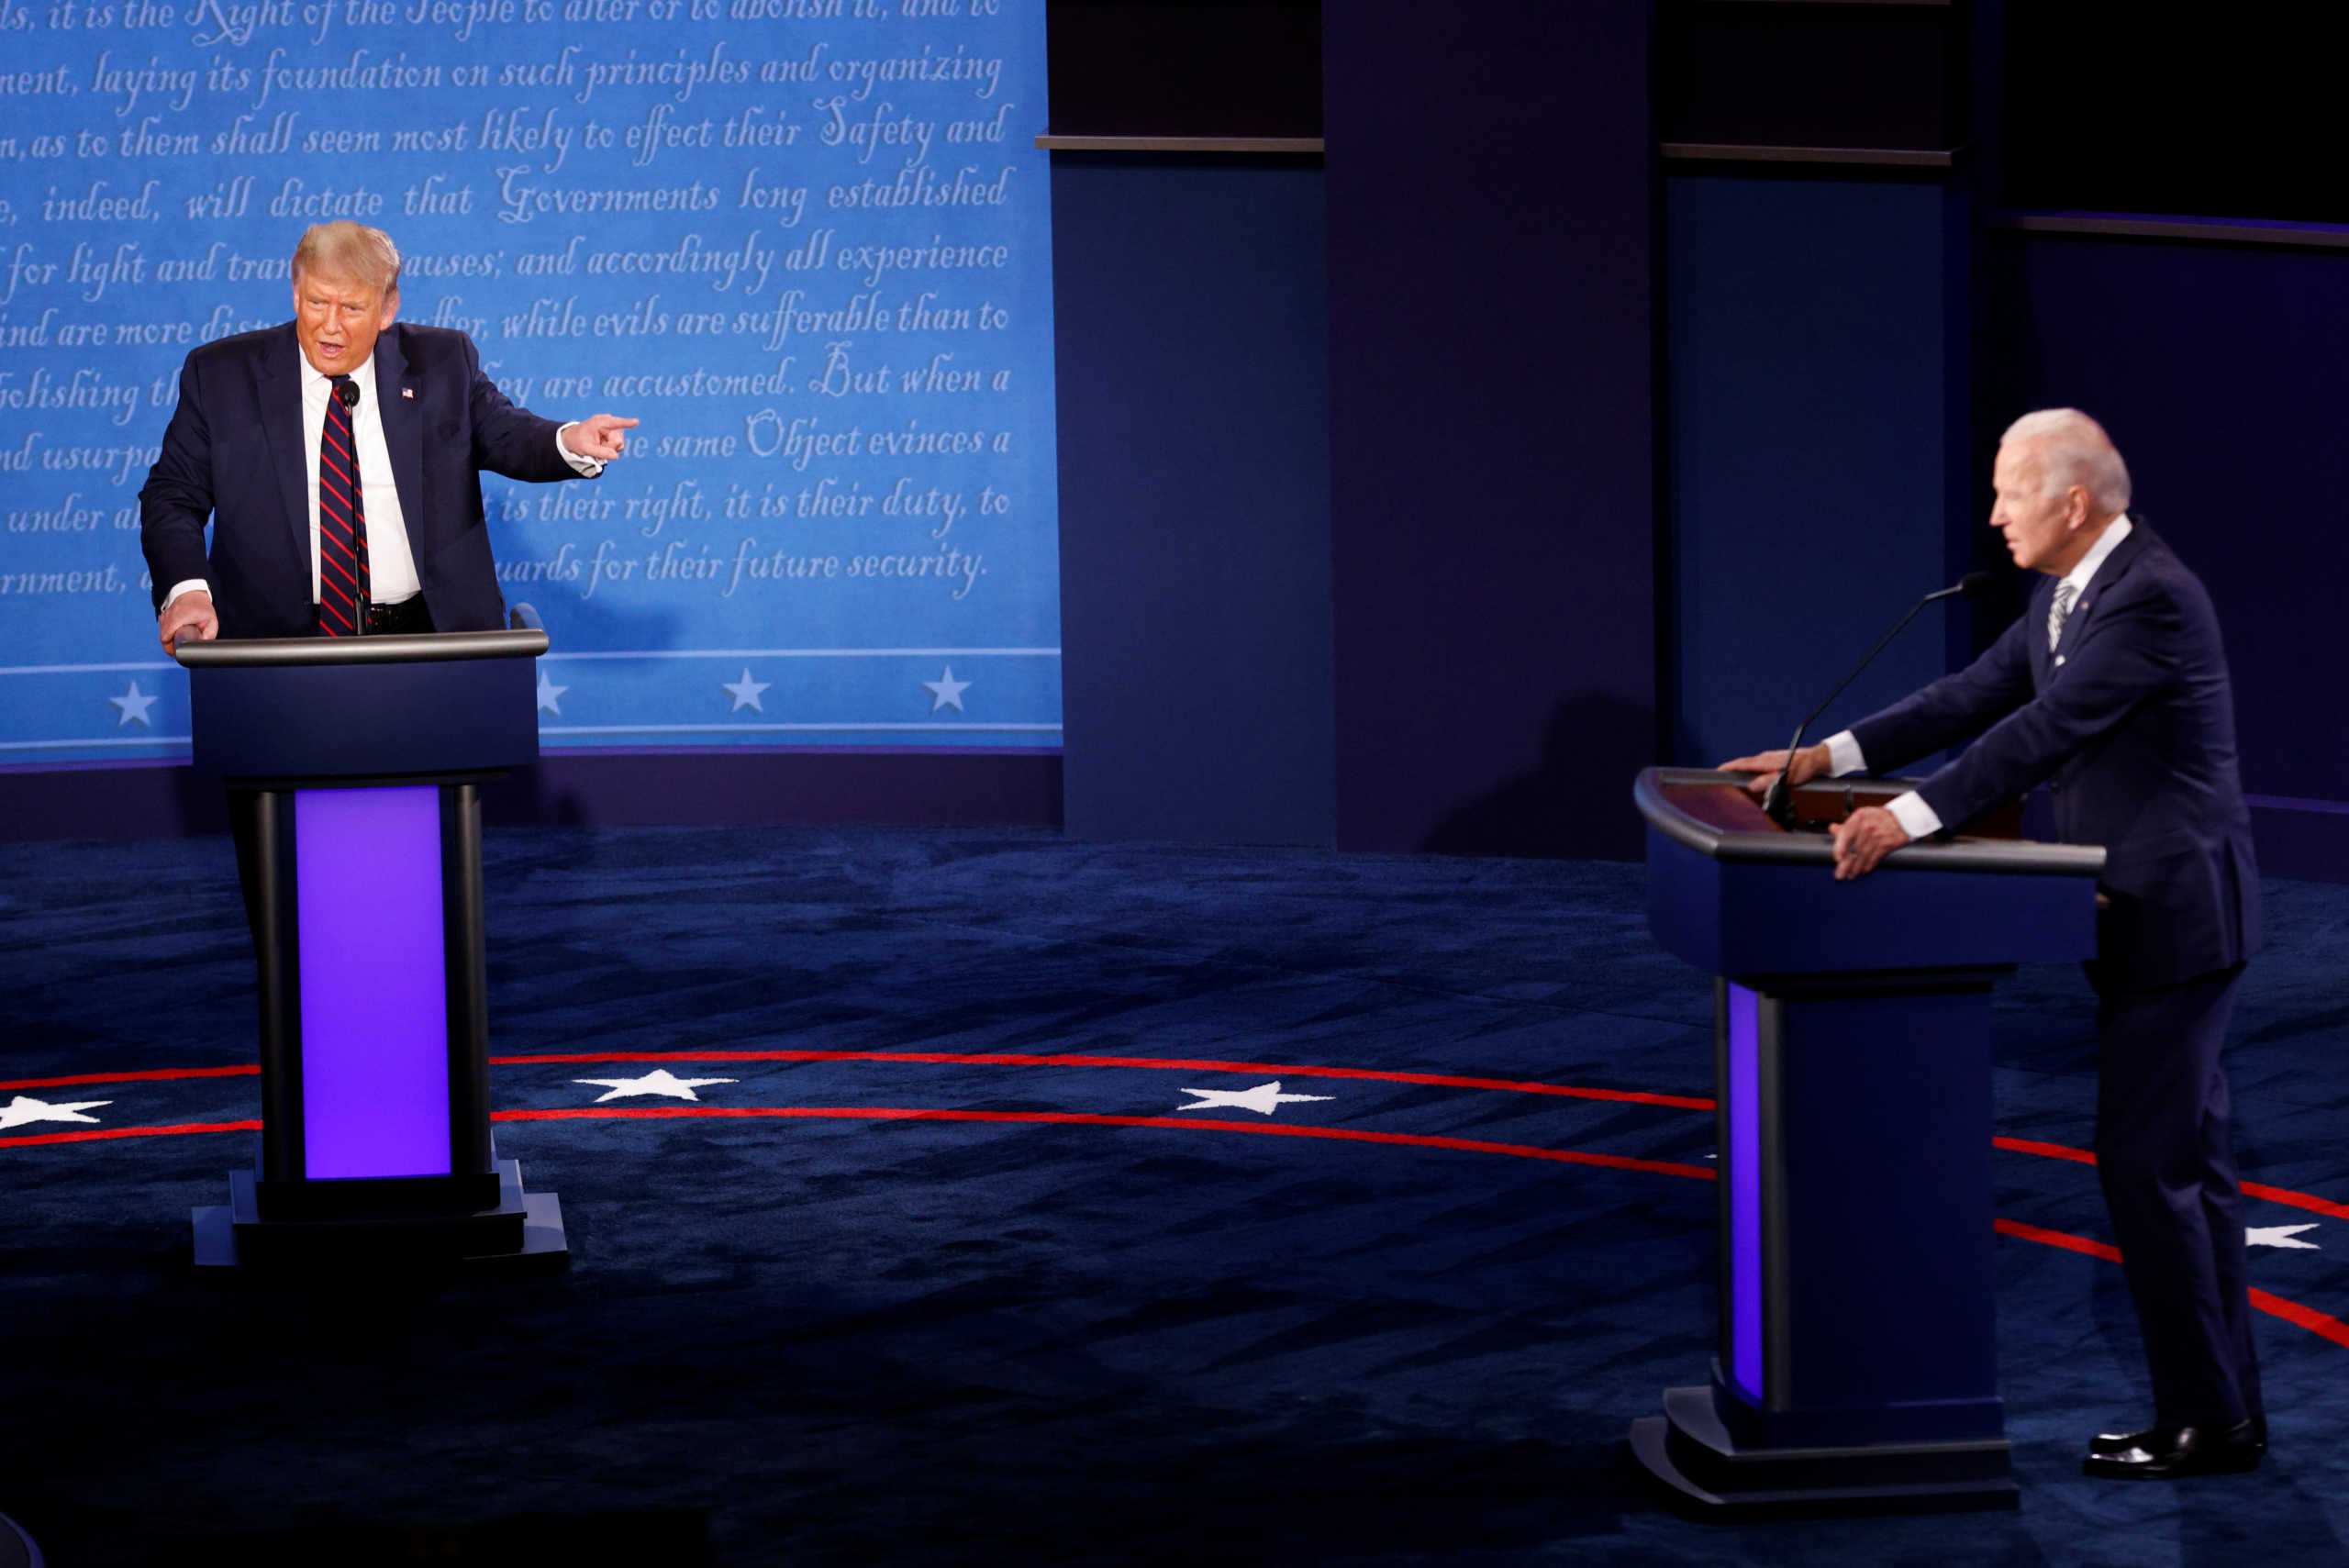 Debate χάους και προσβολών! Τραμπ: Είσαι χαζός – Μπάιντεν: Είσαι καραγκιόζης!